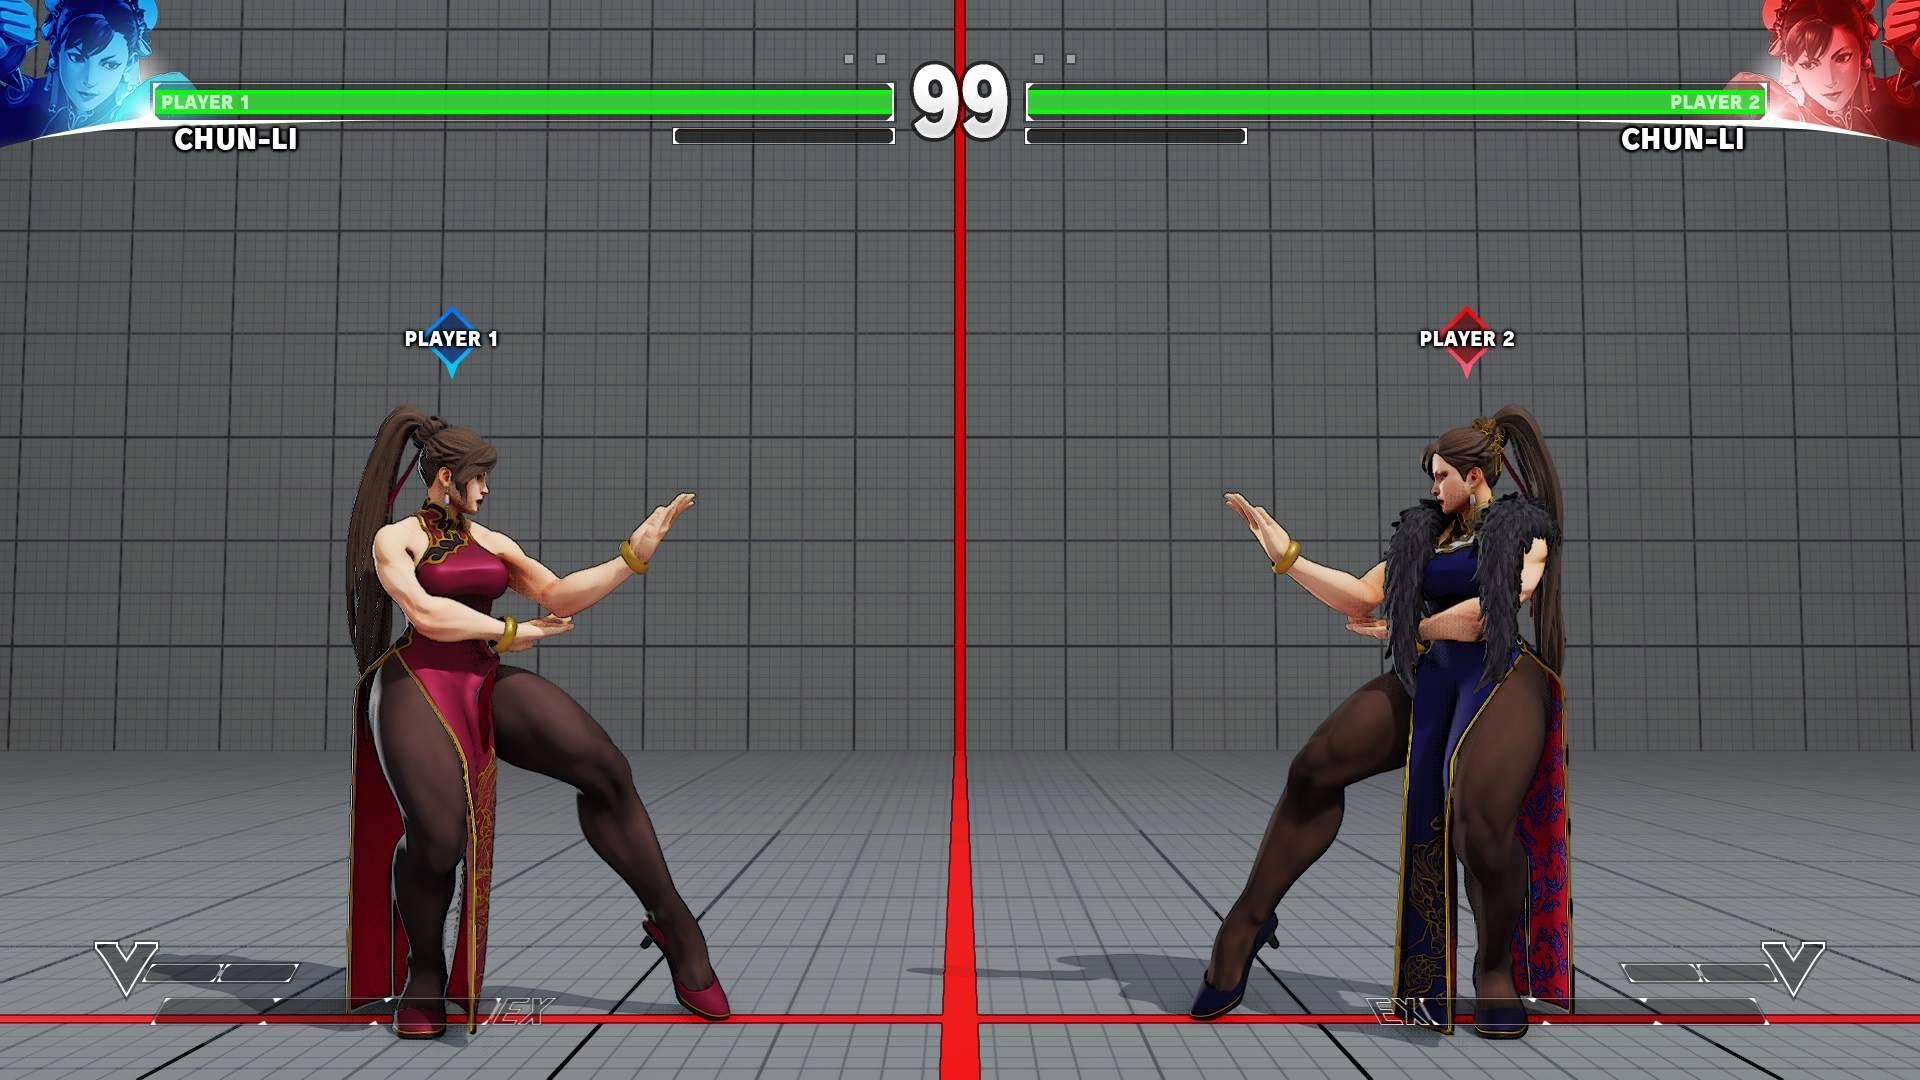 Chun-Li's Street Fighter 5 wardrobe 3 out of 13 image gallery